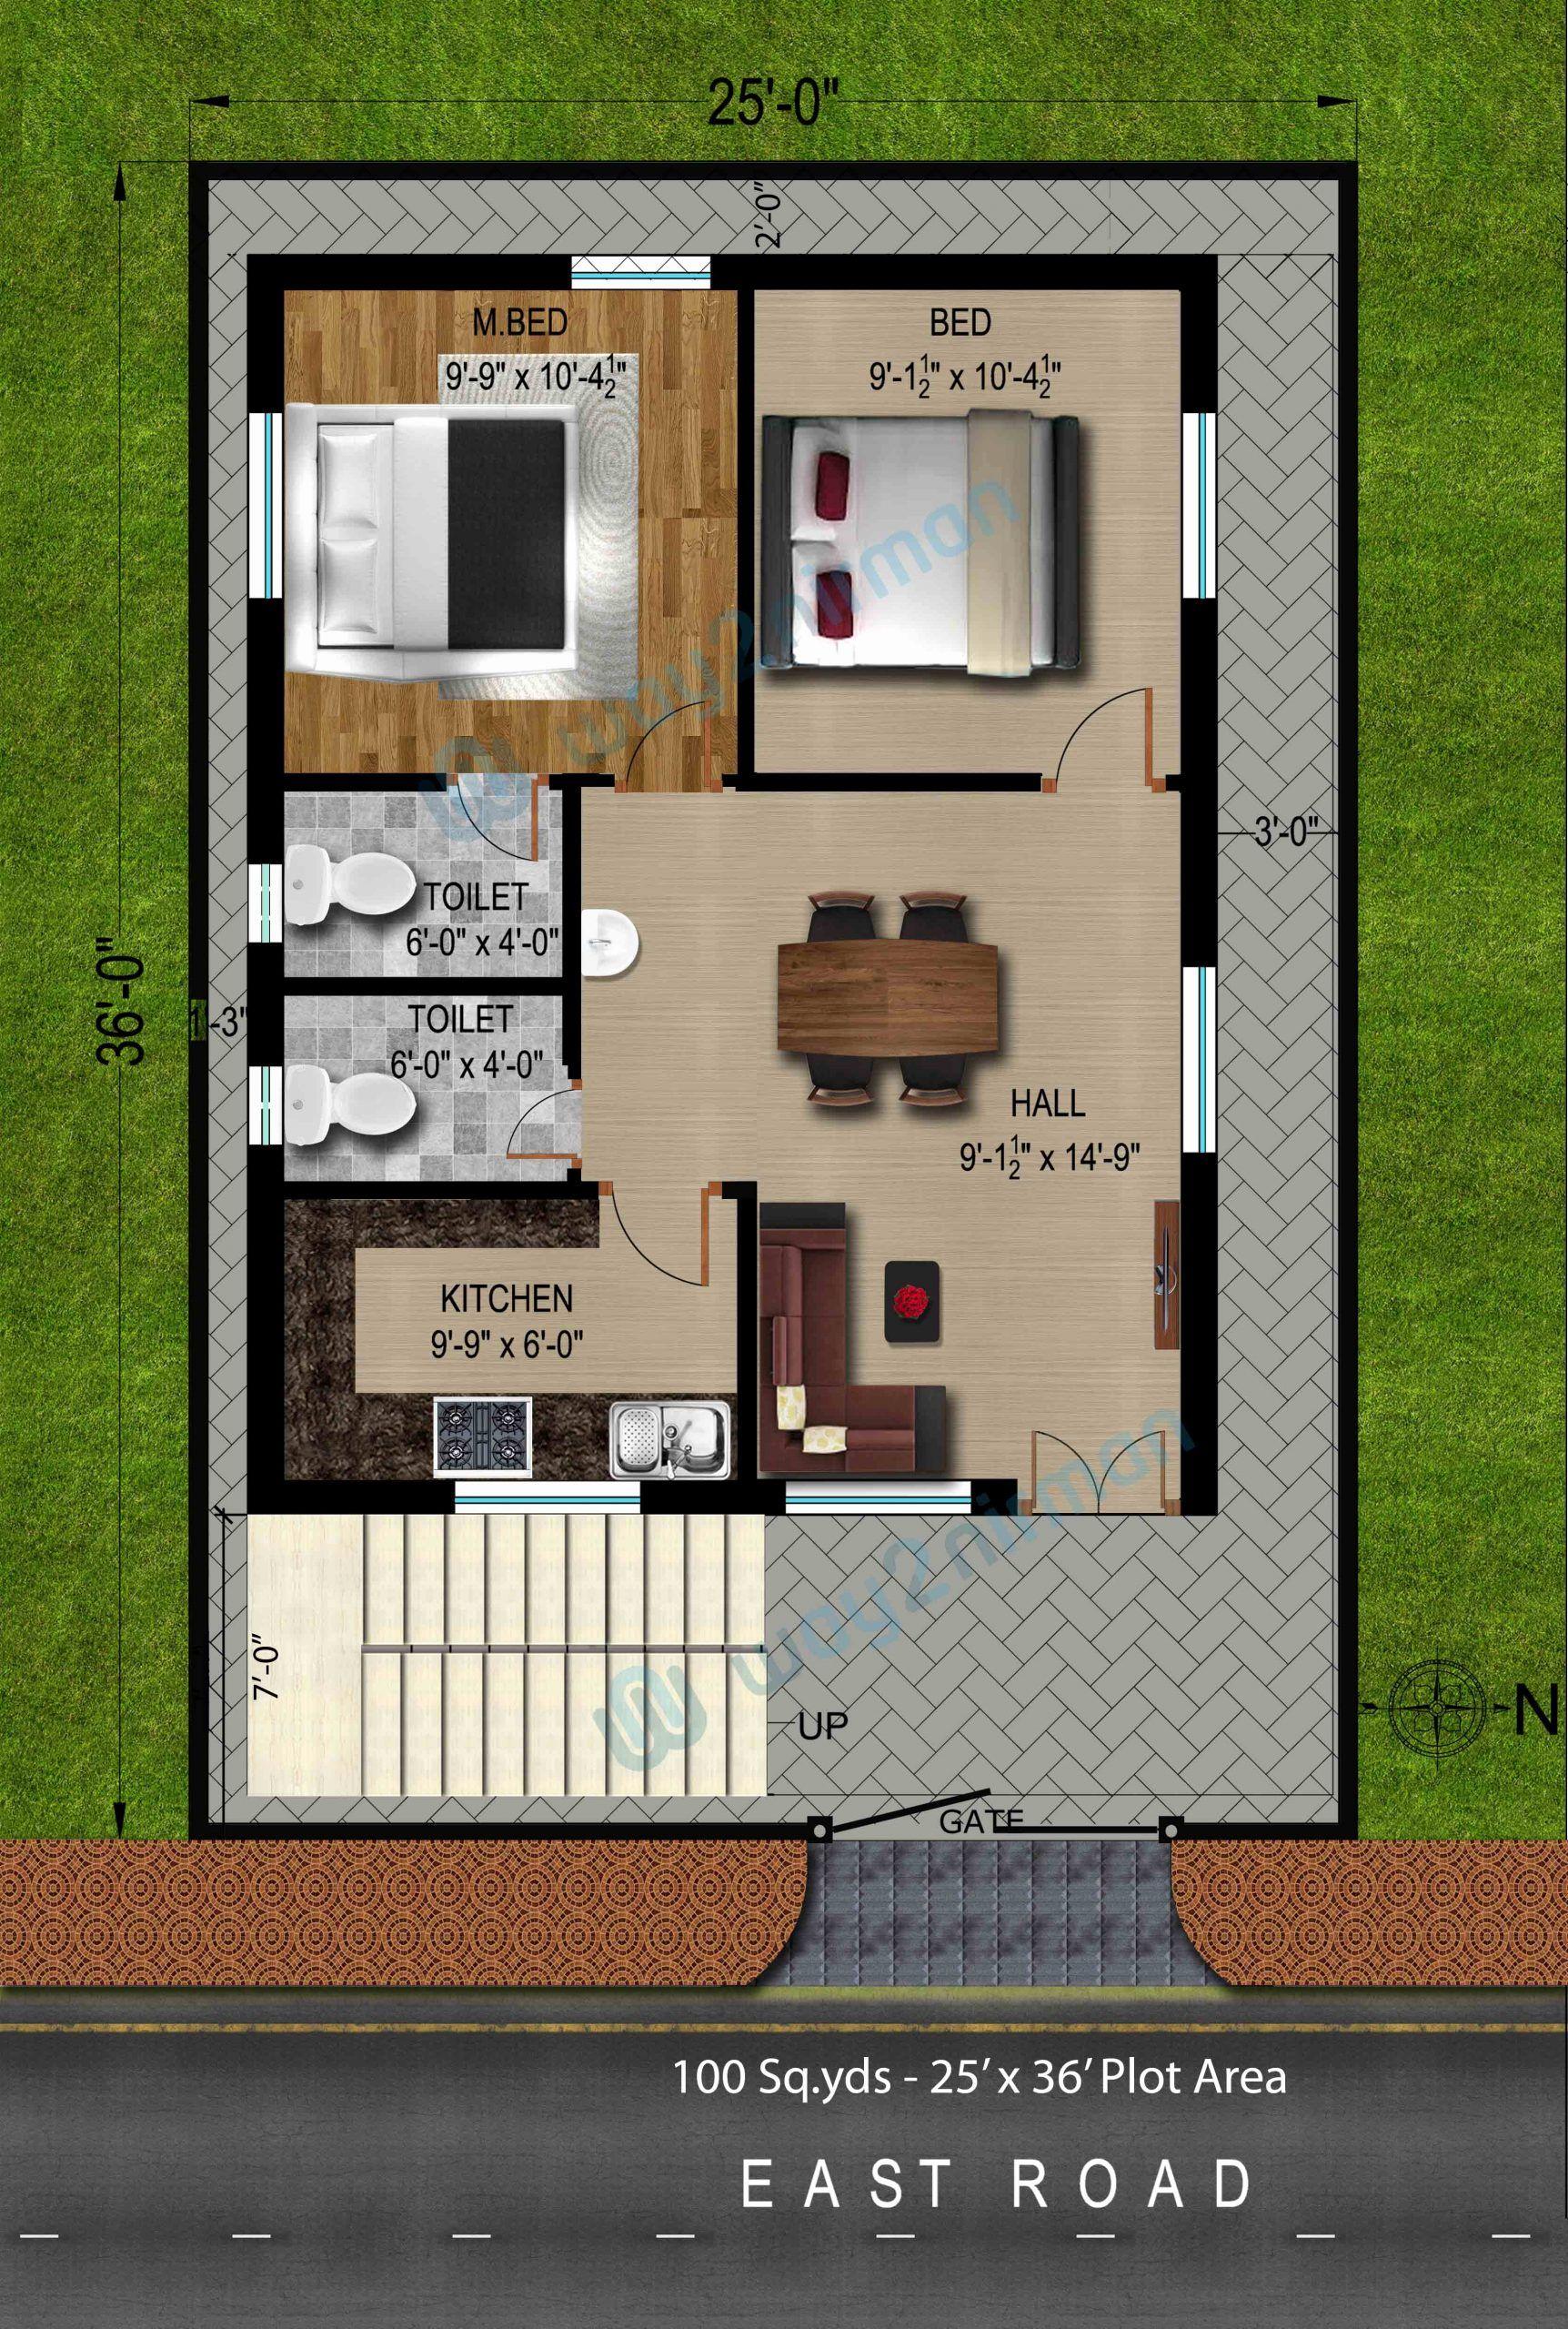 East Face Home Design Fresh 2bhk House Plan East Facing Elevation Autocad Design 2bhk House Plan 20x30 House Plans 30x40 House Plans